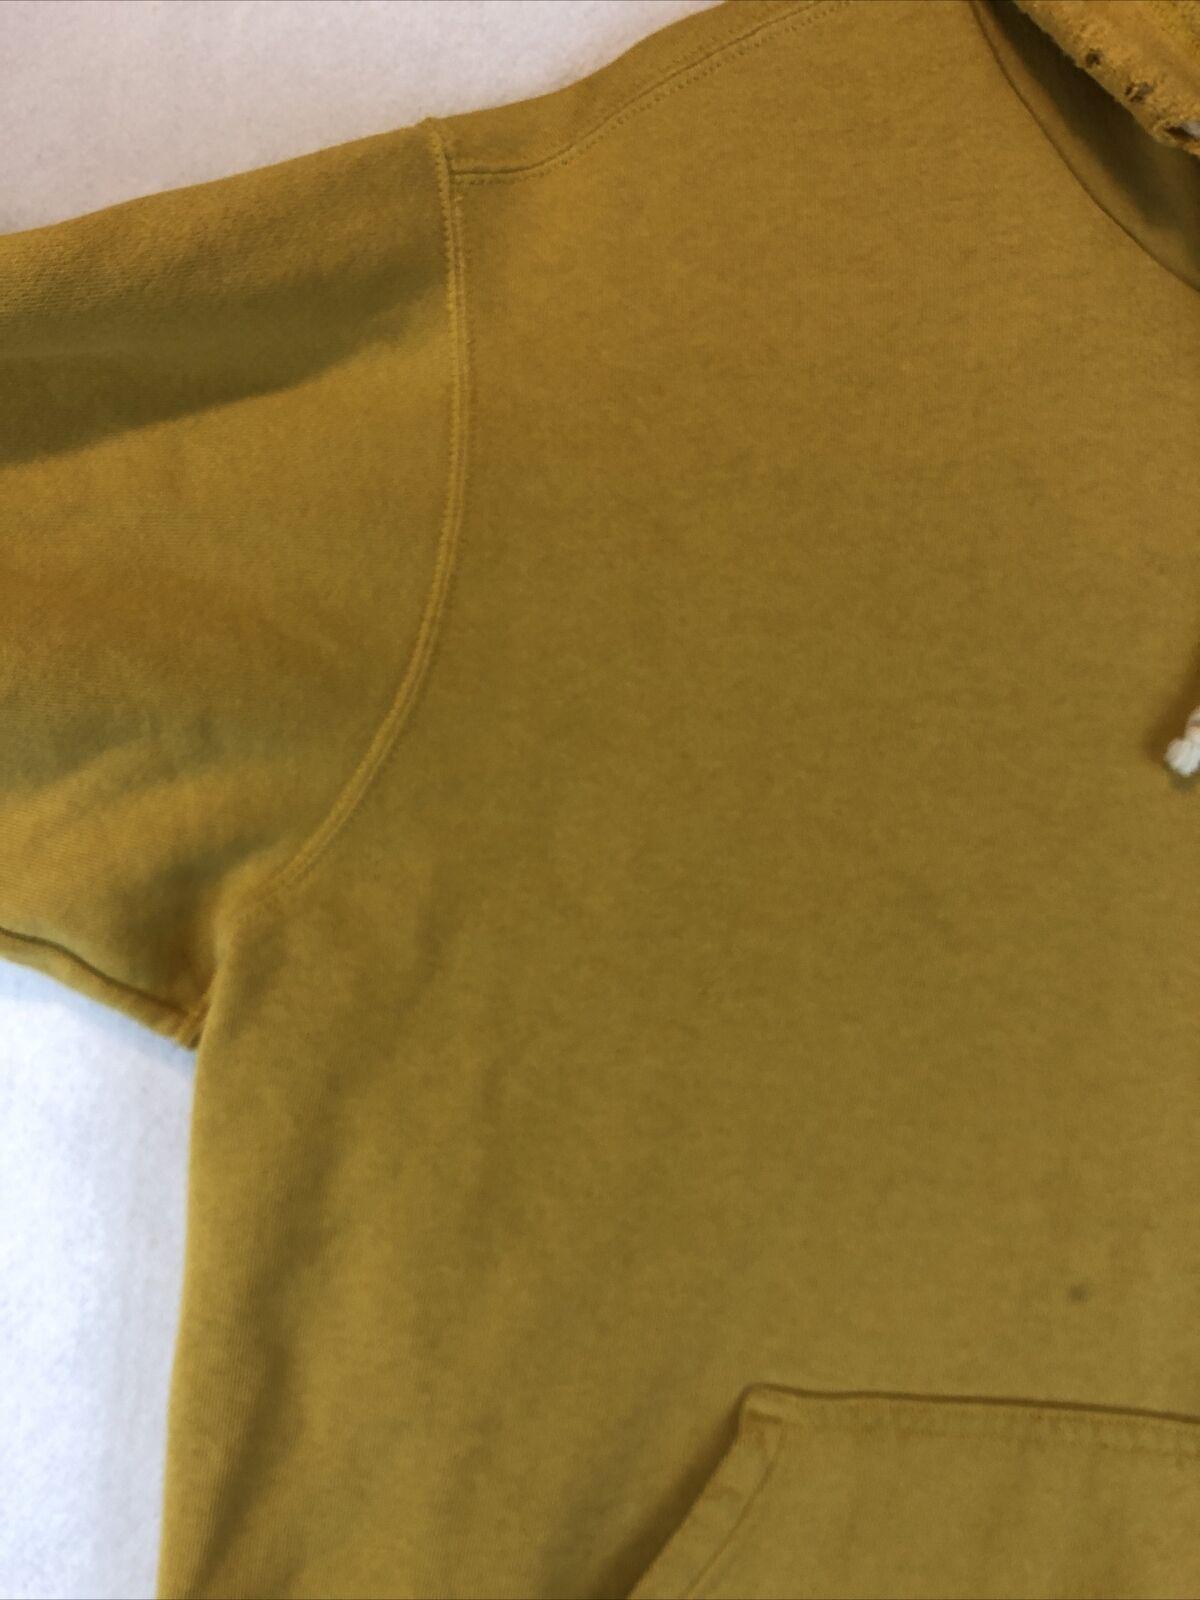 VTG Nike Rare Mustard Yellow Hoodie Sweatshirt Si… - image 4